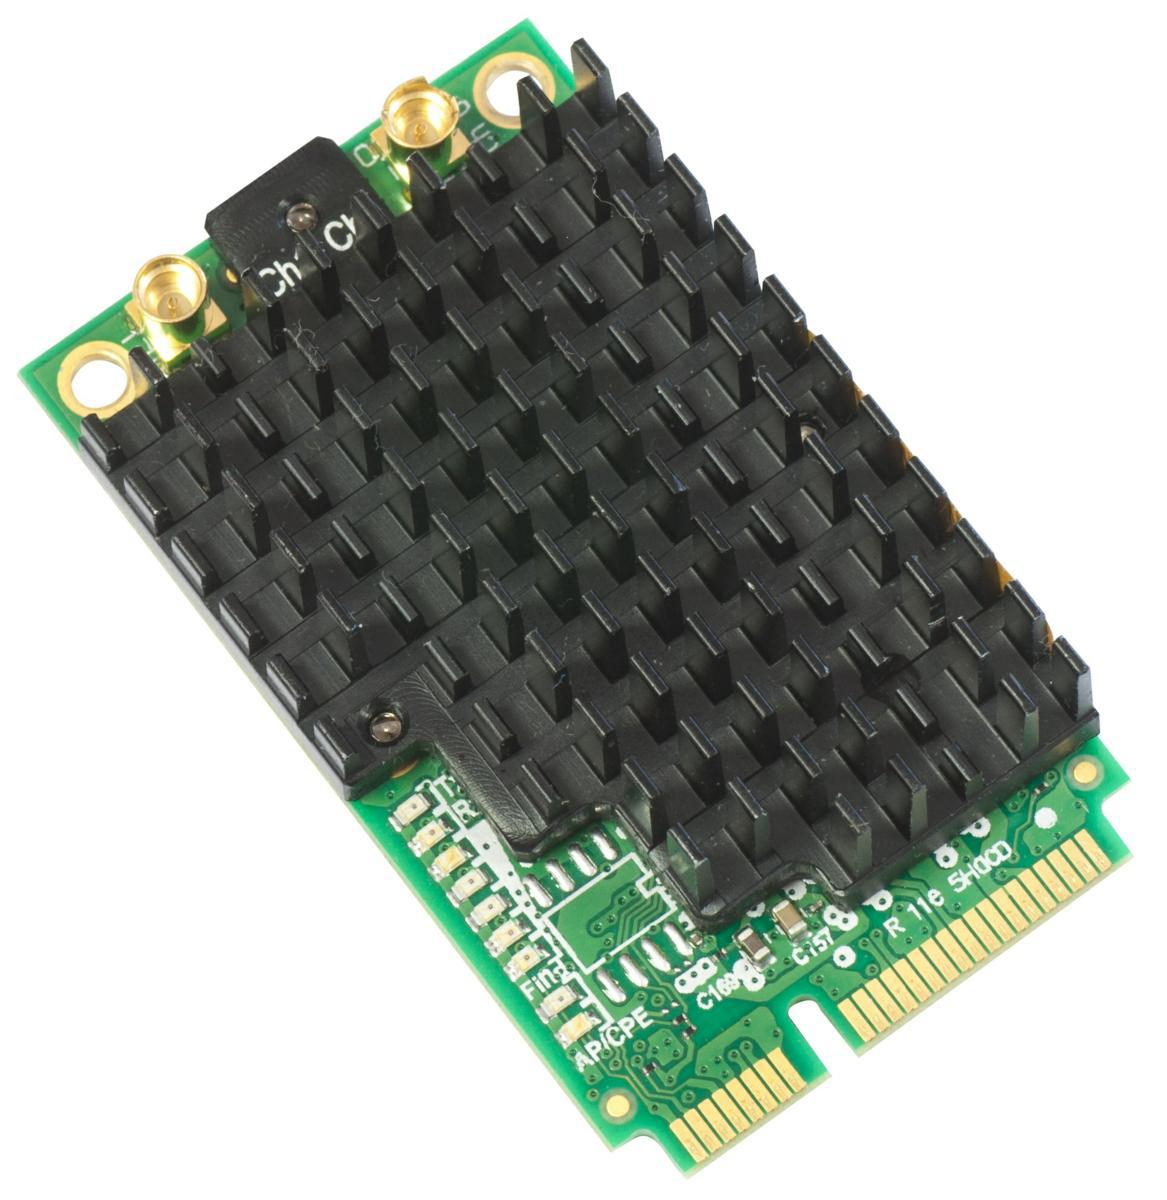 SICE Distributore Ufficiale  Interfaces MikroTik 802.11a/c High Power miniPCI-e card with MMCX connectors | R11E-5HACD